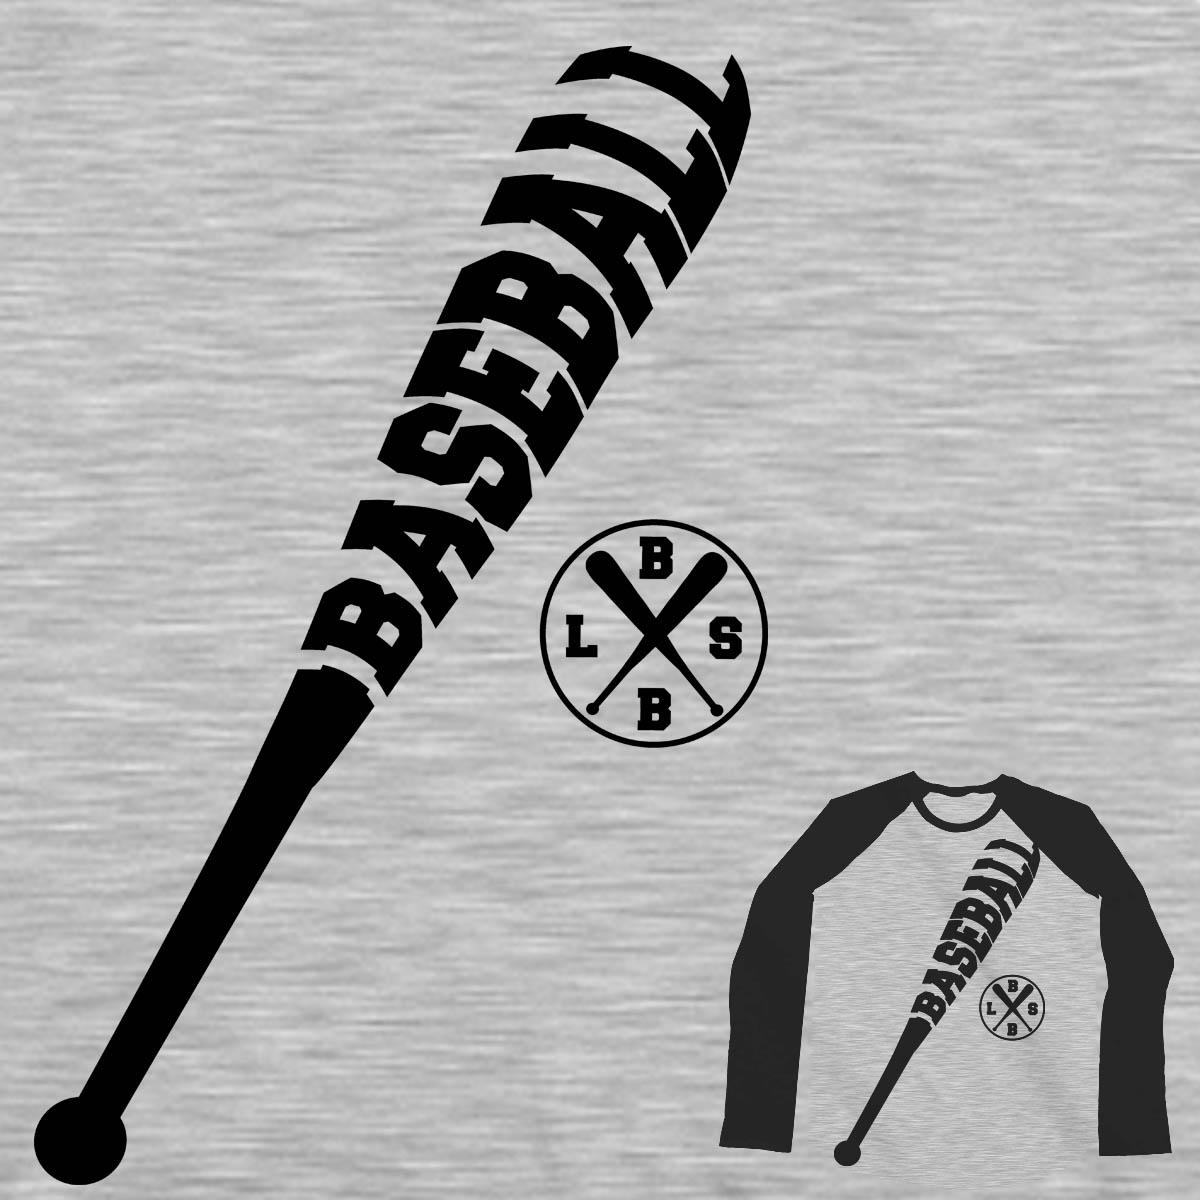 XBASEBALLX by gupikus on Threadless